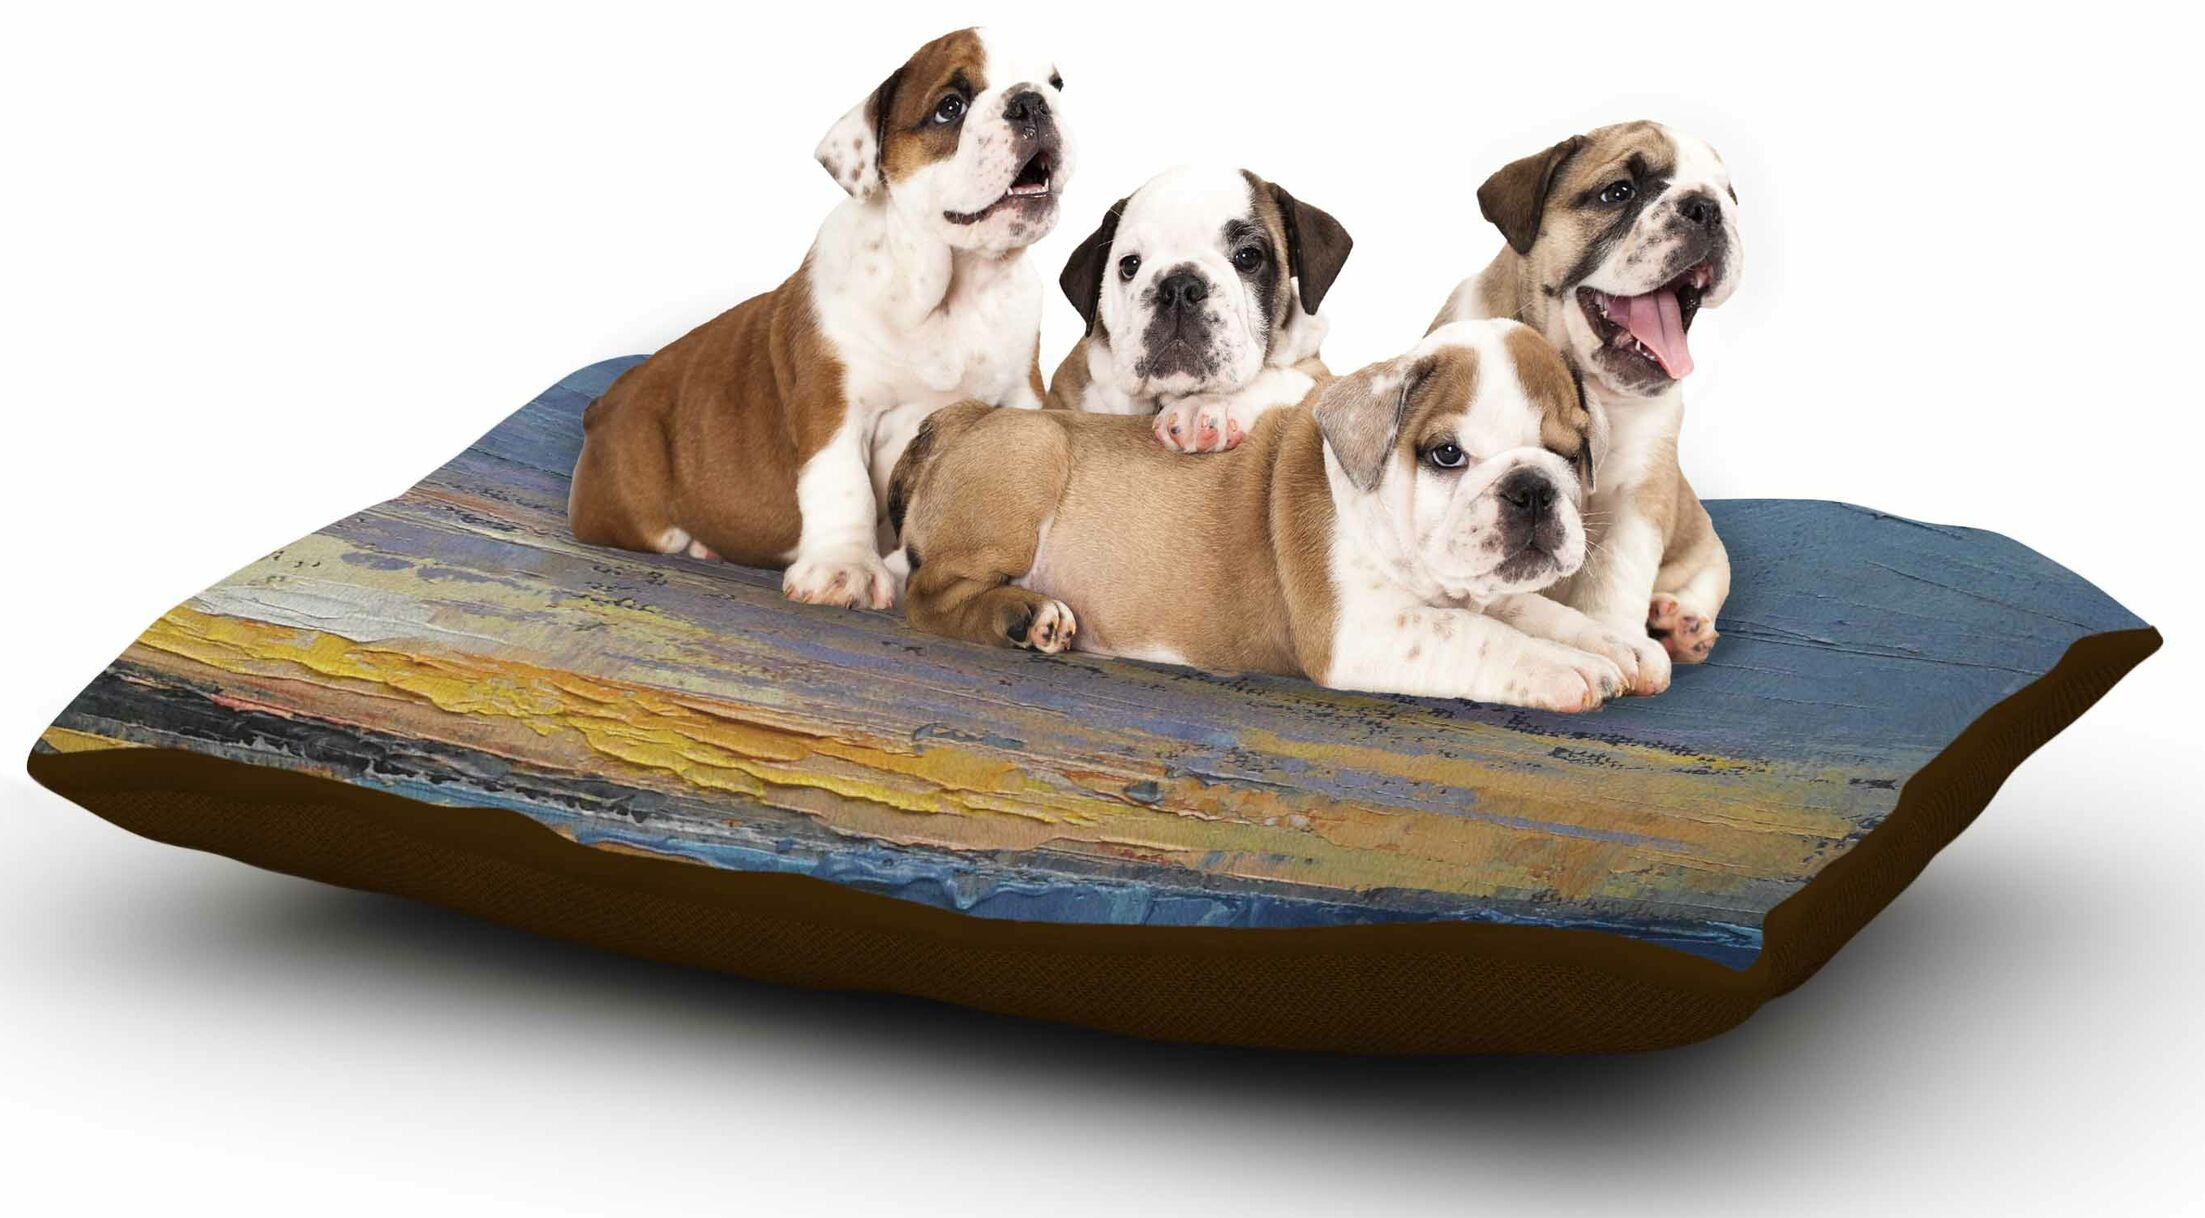 Carol Schiff 'Caribbean Sunset' Dog Pillow with Fleece Cozy Top